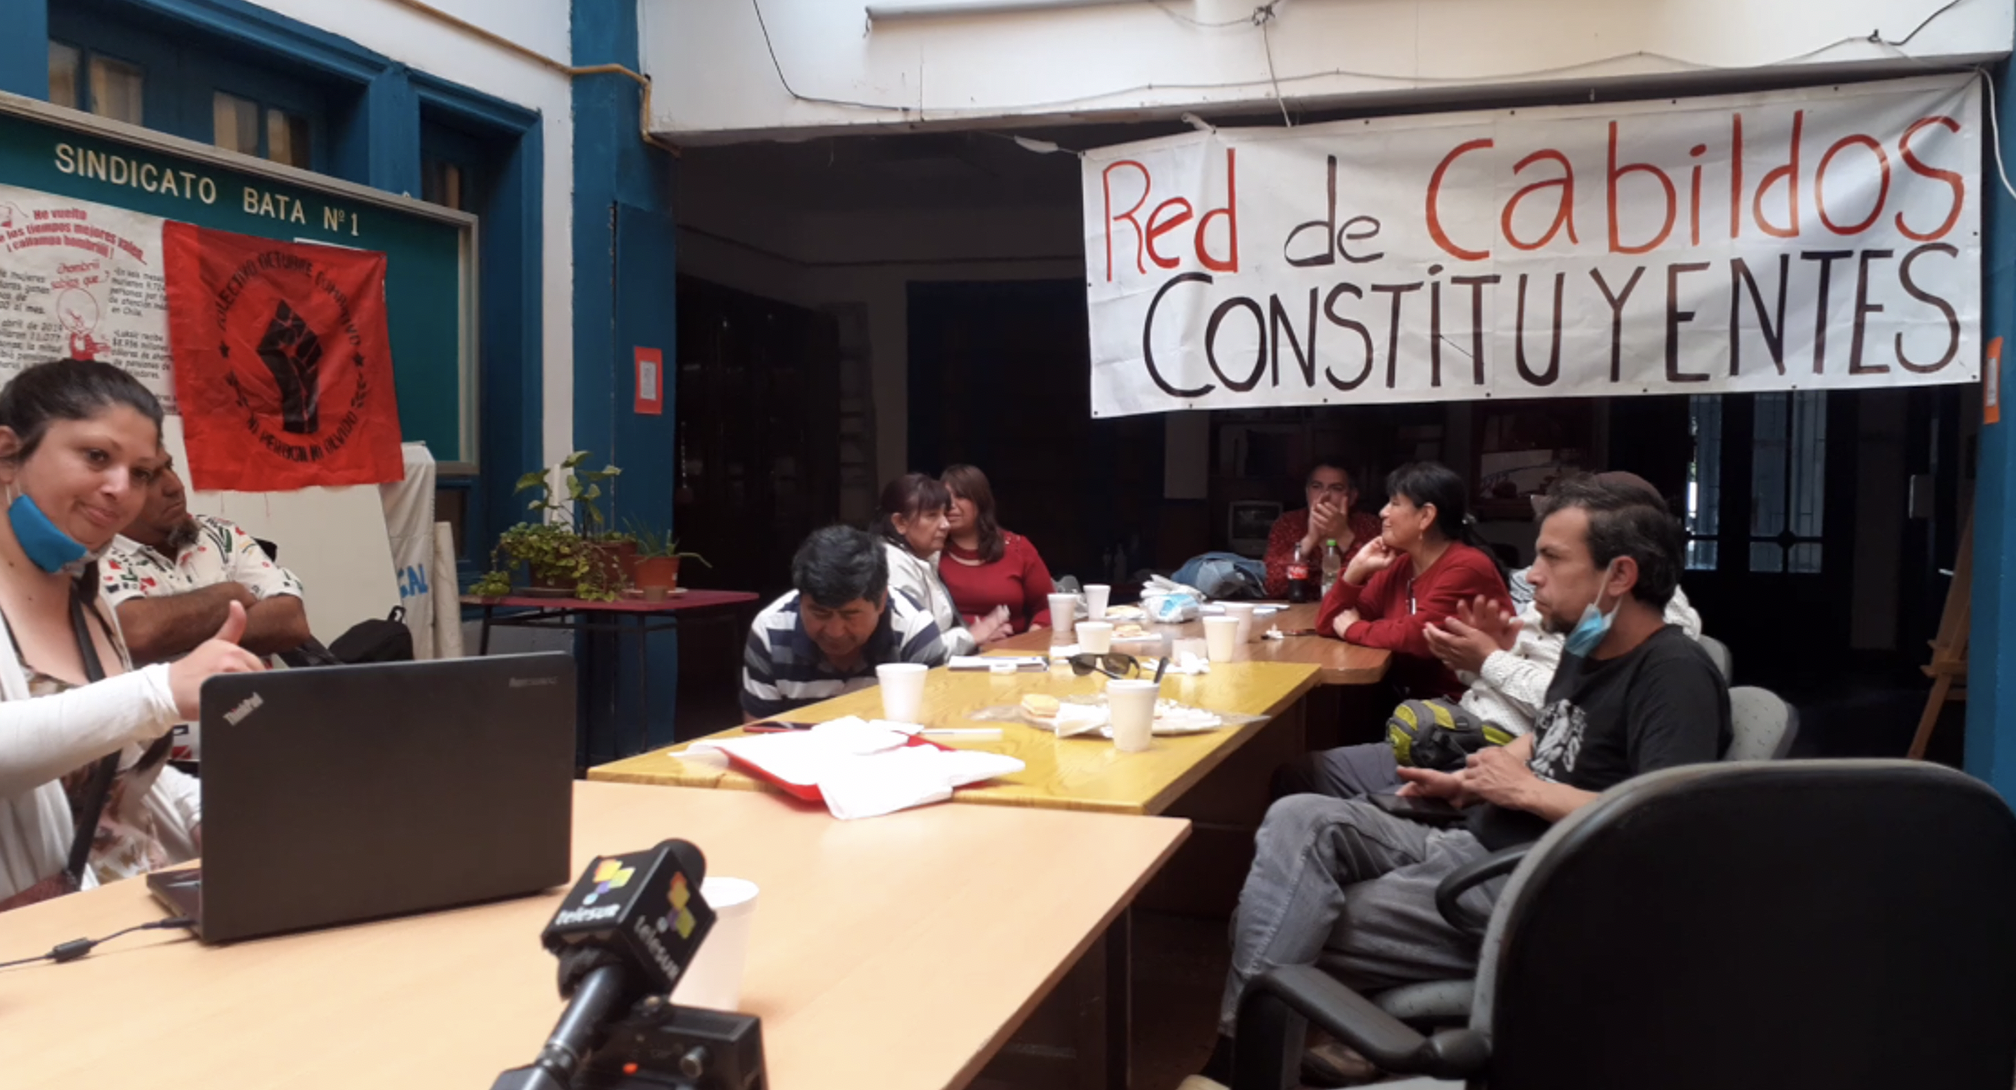 Red de Cabildos Constituyentes define próximos pasos